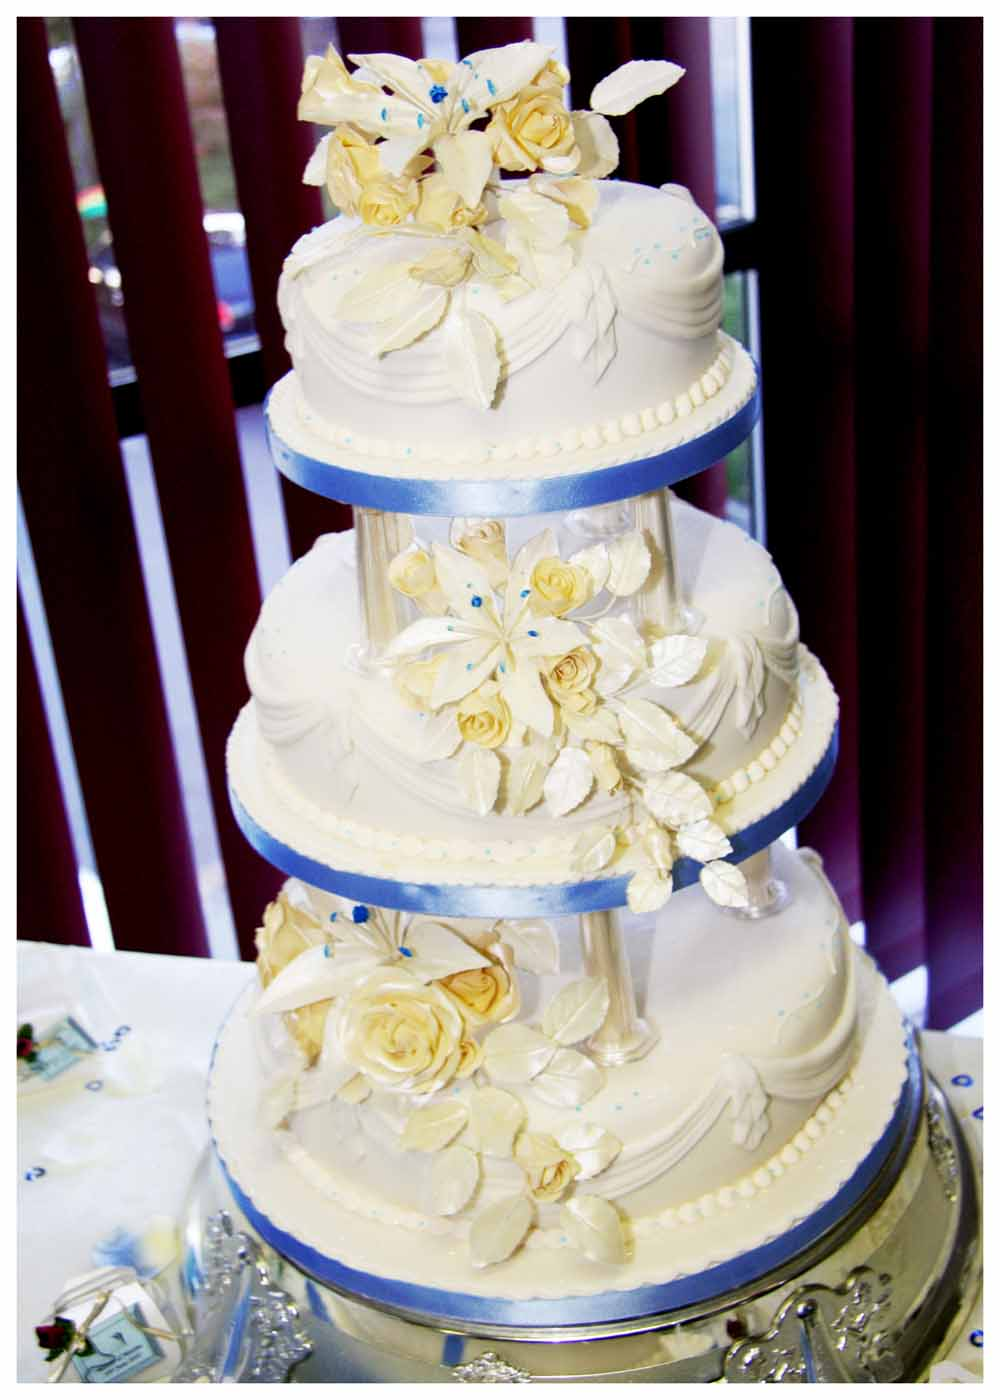 CAKE photos by Simeon Thaw copyright  2014 (63).jpg